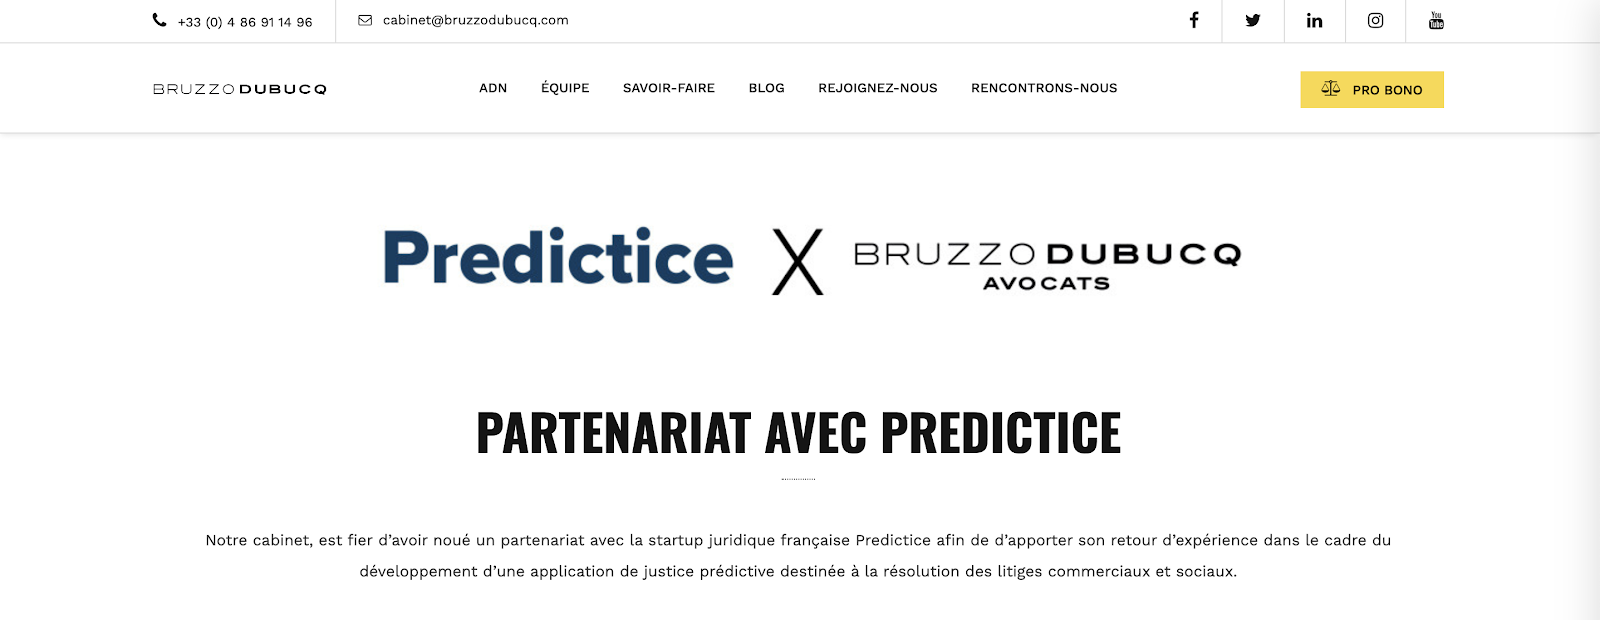 site internet du cabinet d'avocats Bruzzo Dubucq